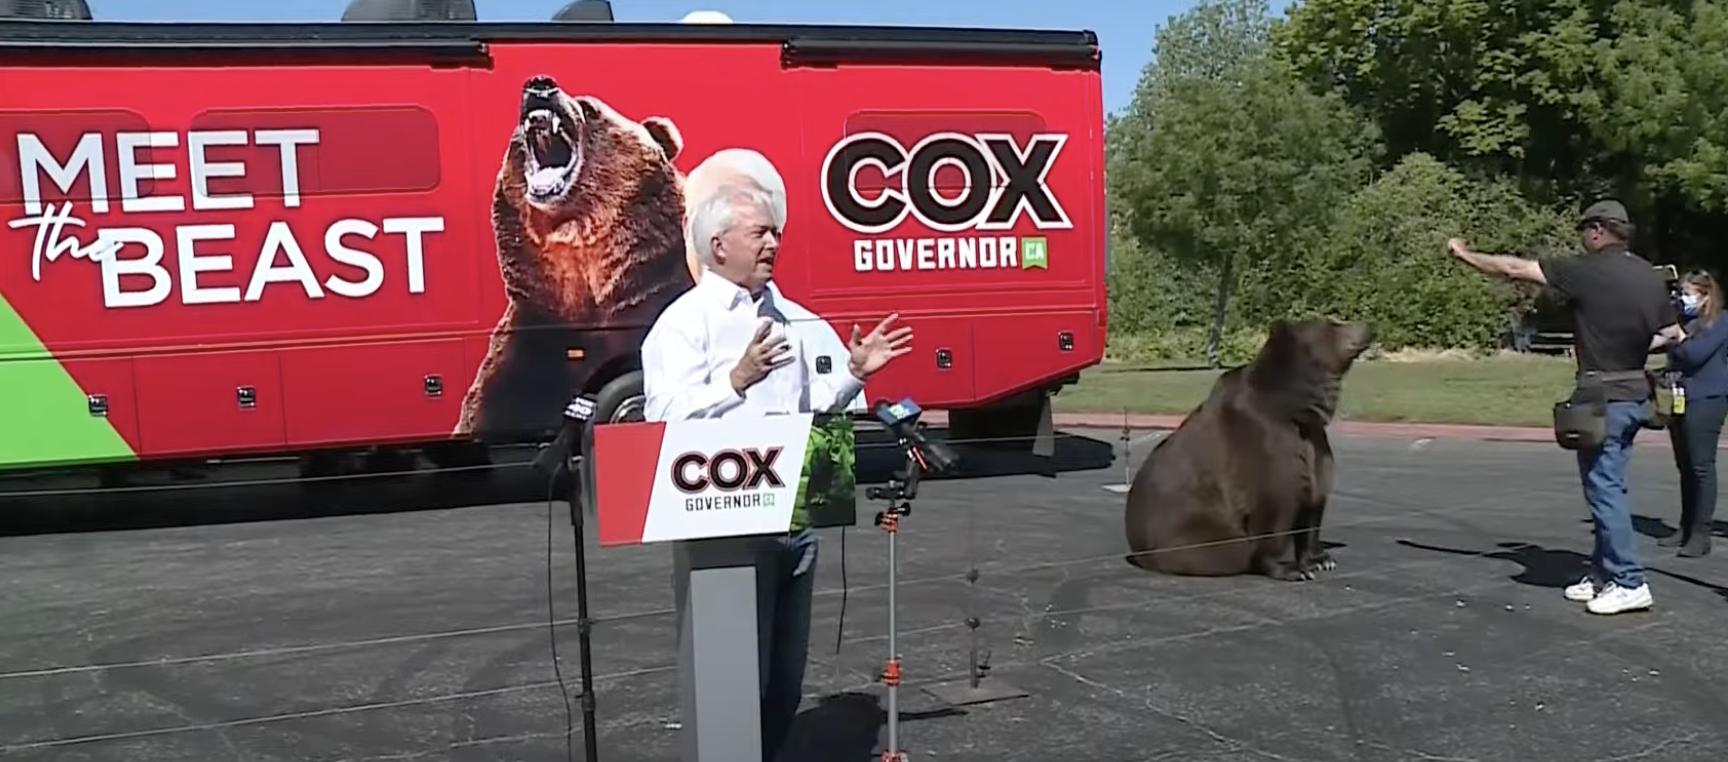 California Governor Recall Devolves Into a Circus | The American Spectator | USA News and PoliticsThe American Spectator | USA News and Politics